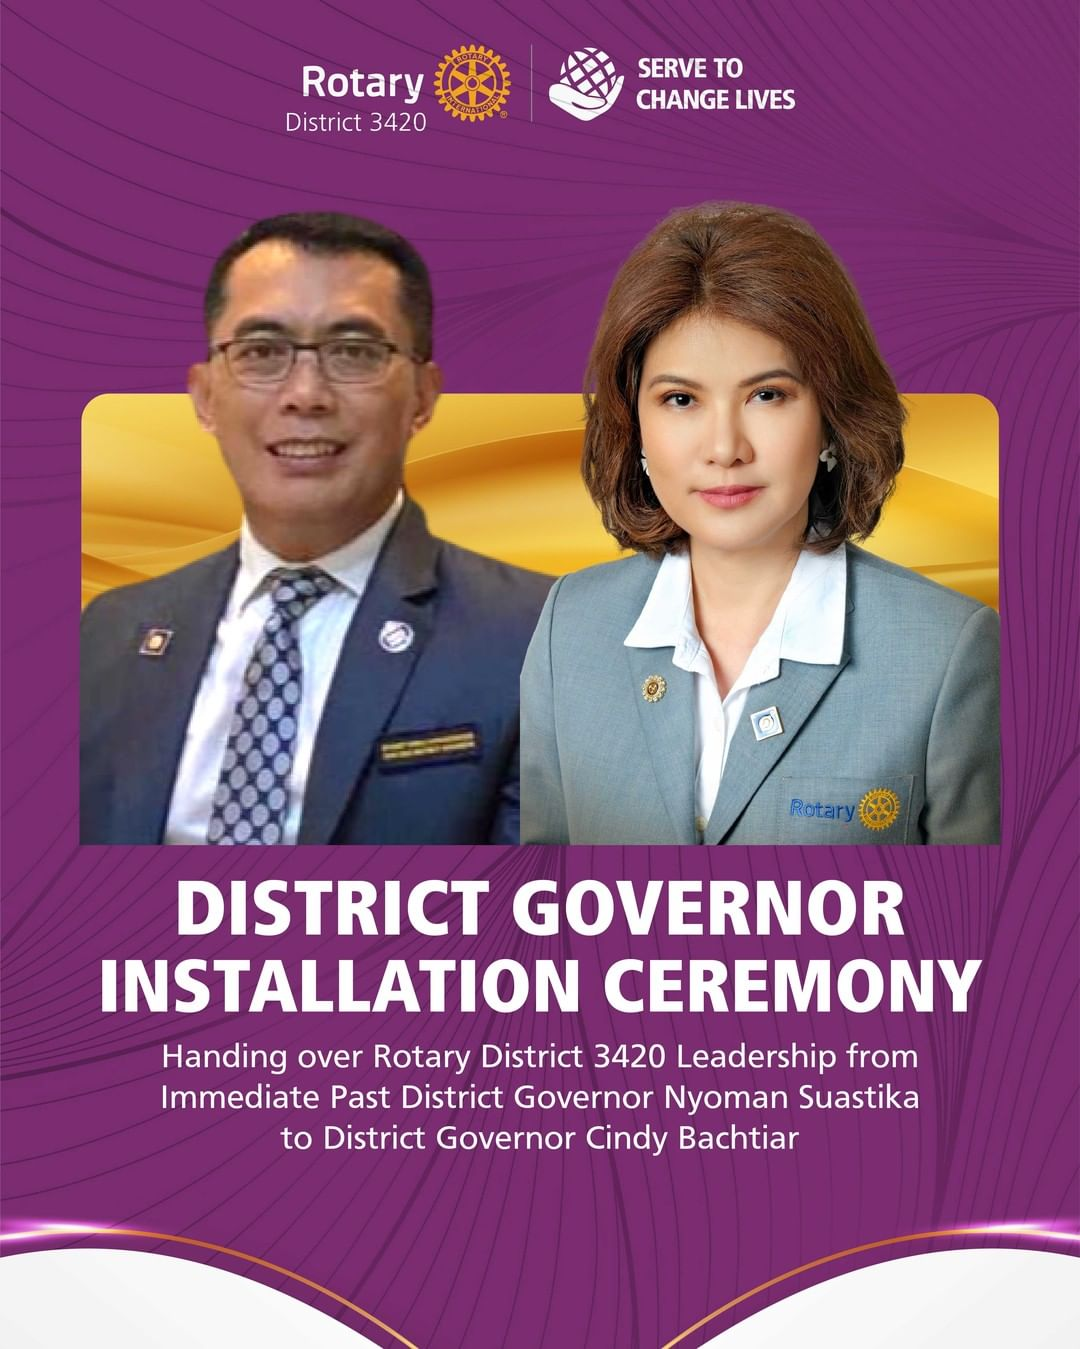 District Governor Installation Ceremony